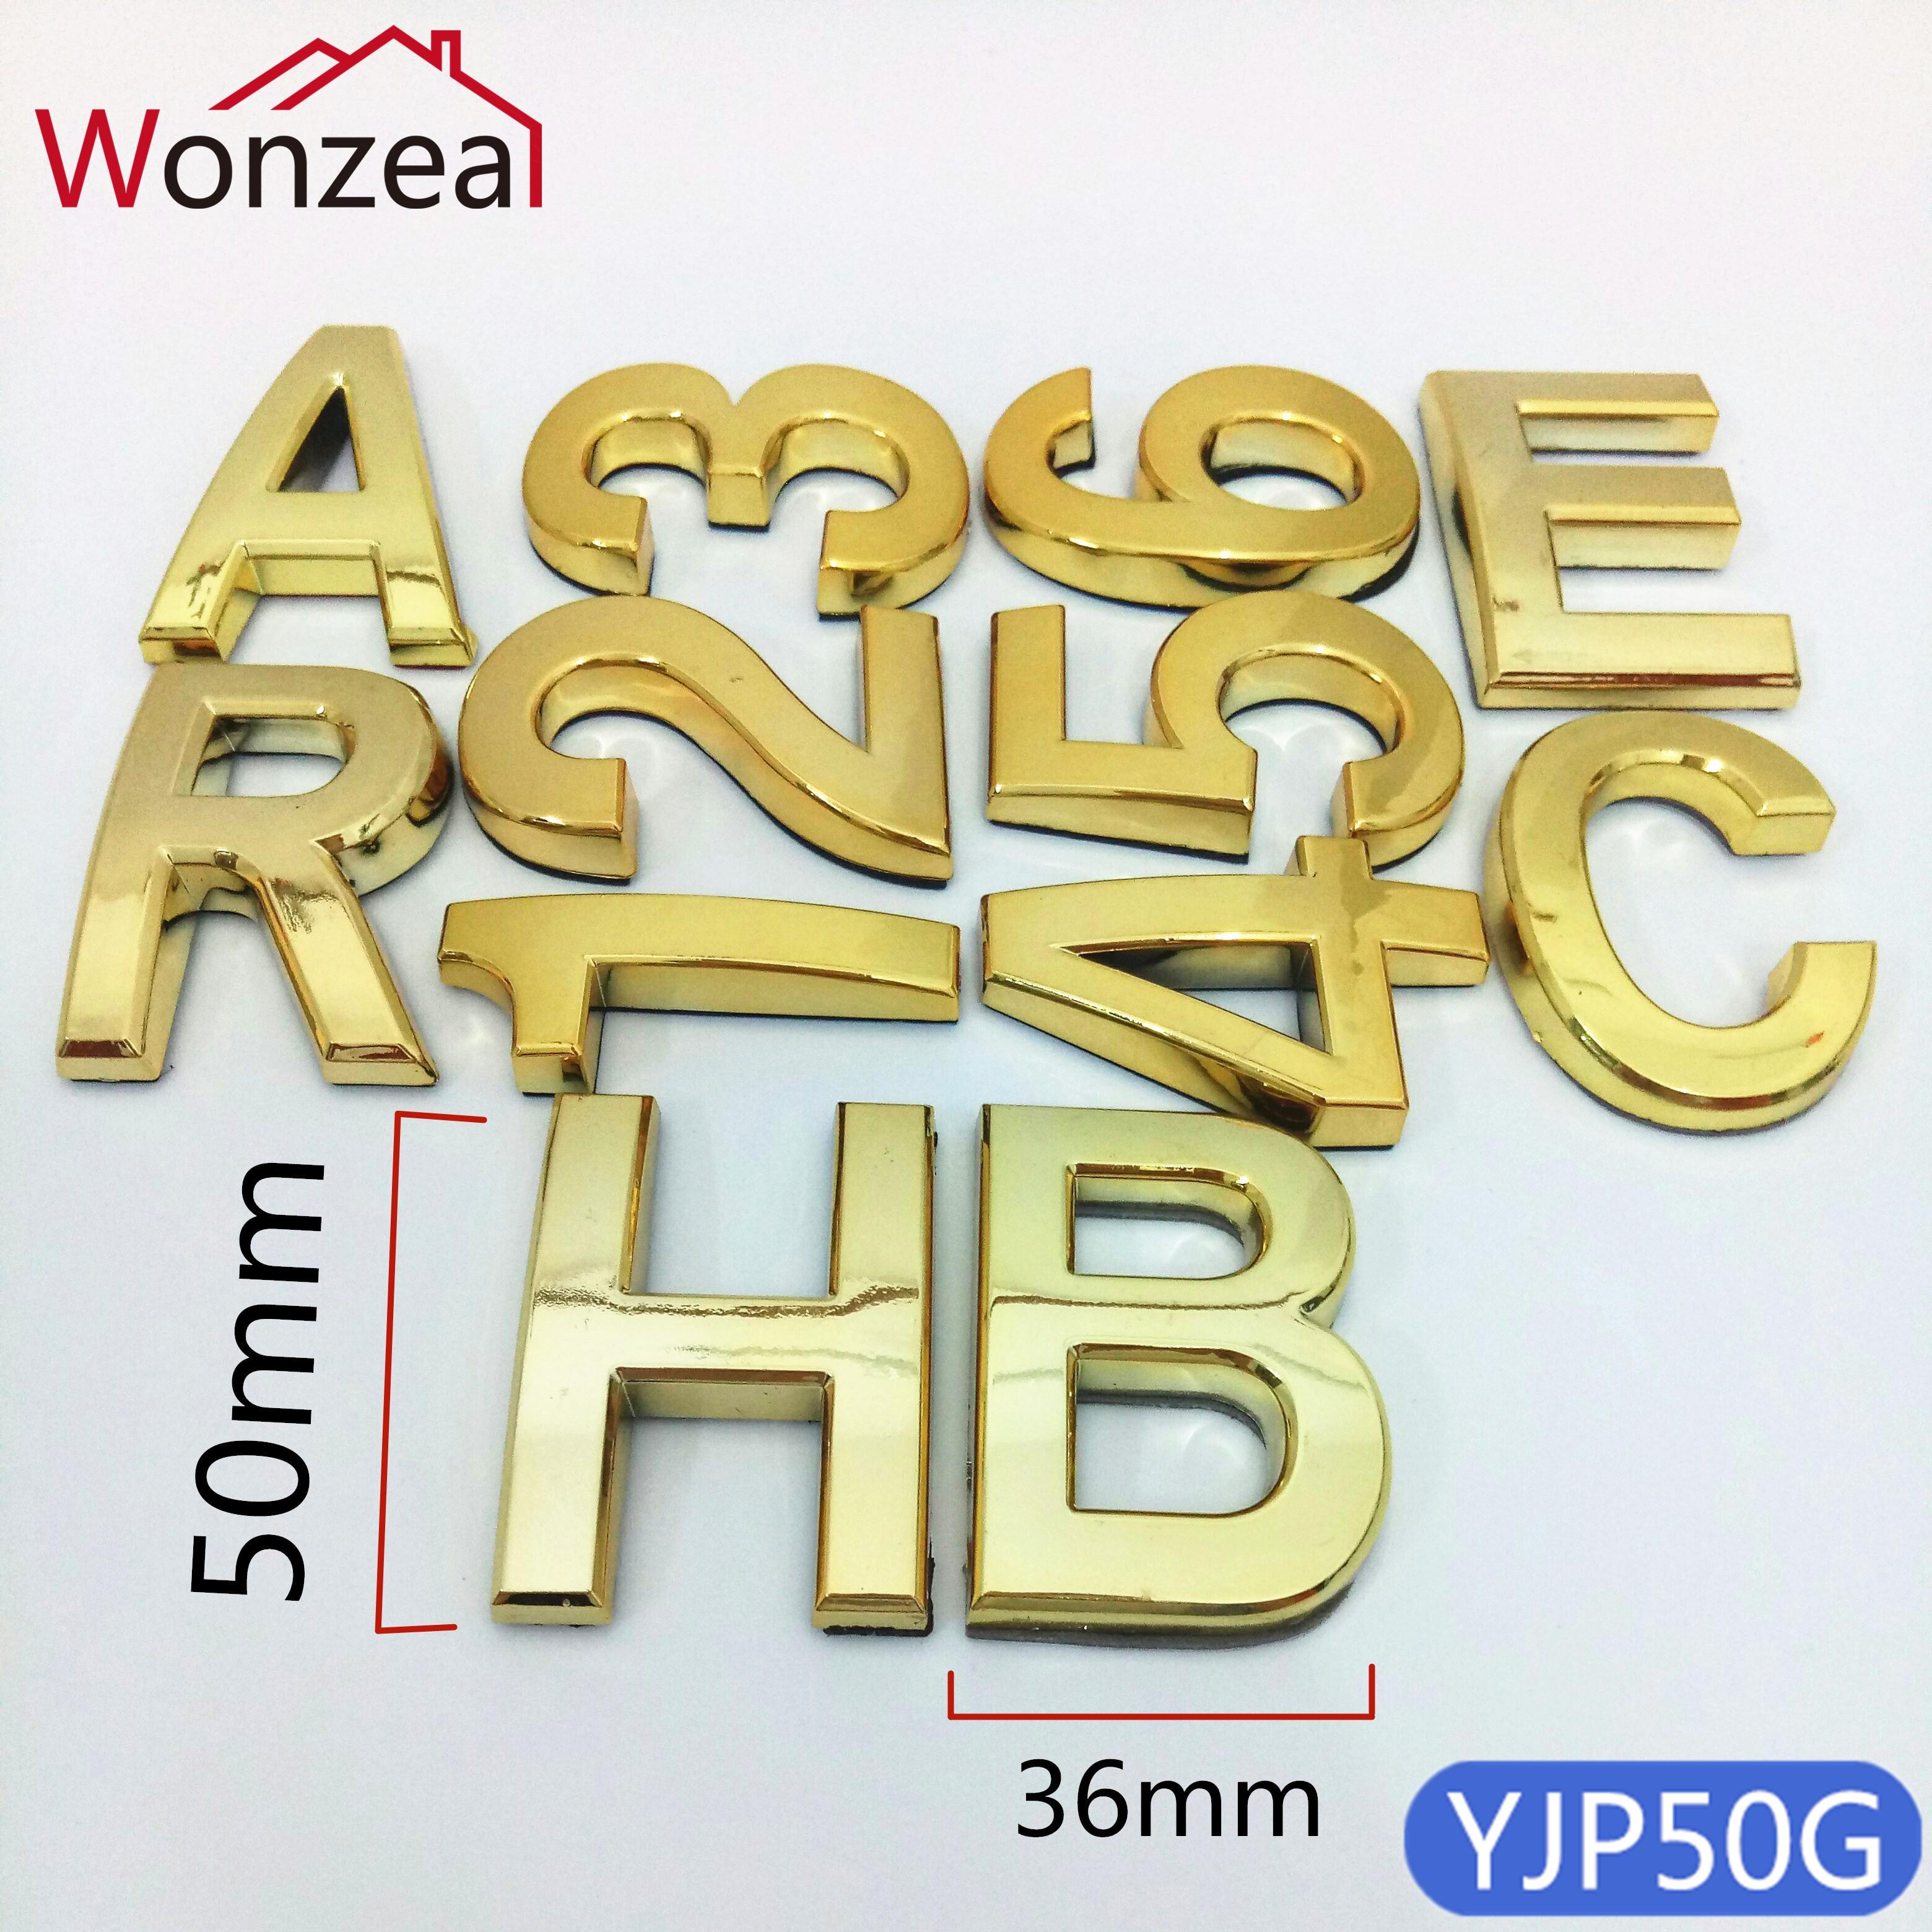 Placa de plástico abs 50mm, porta dourada endereço moderno placa número casa hotel digits sinal adesivo